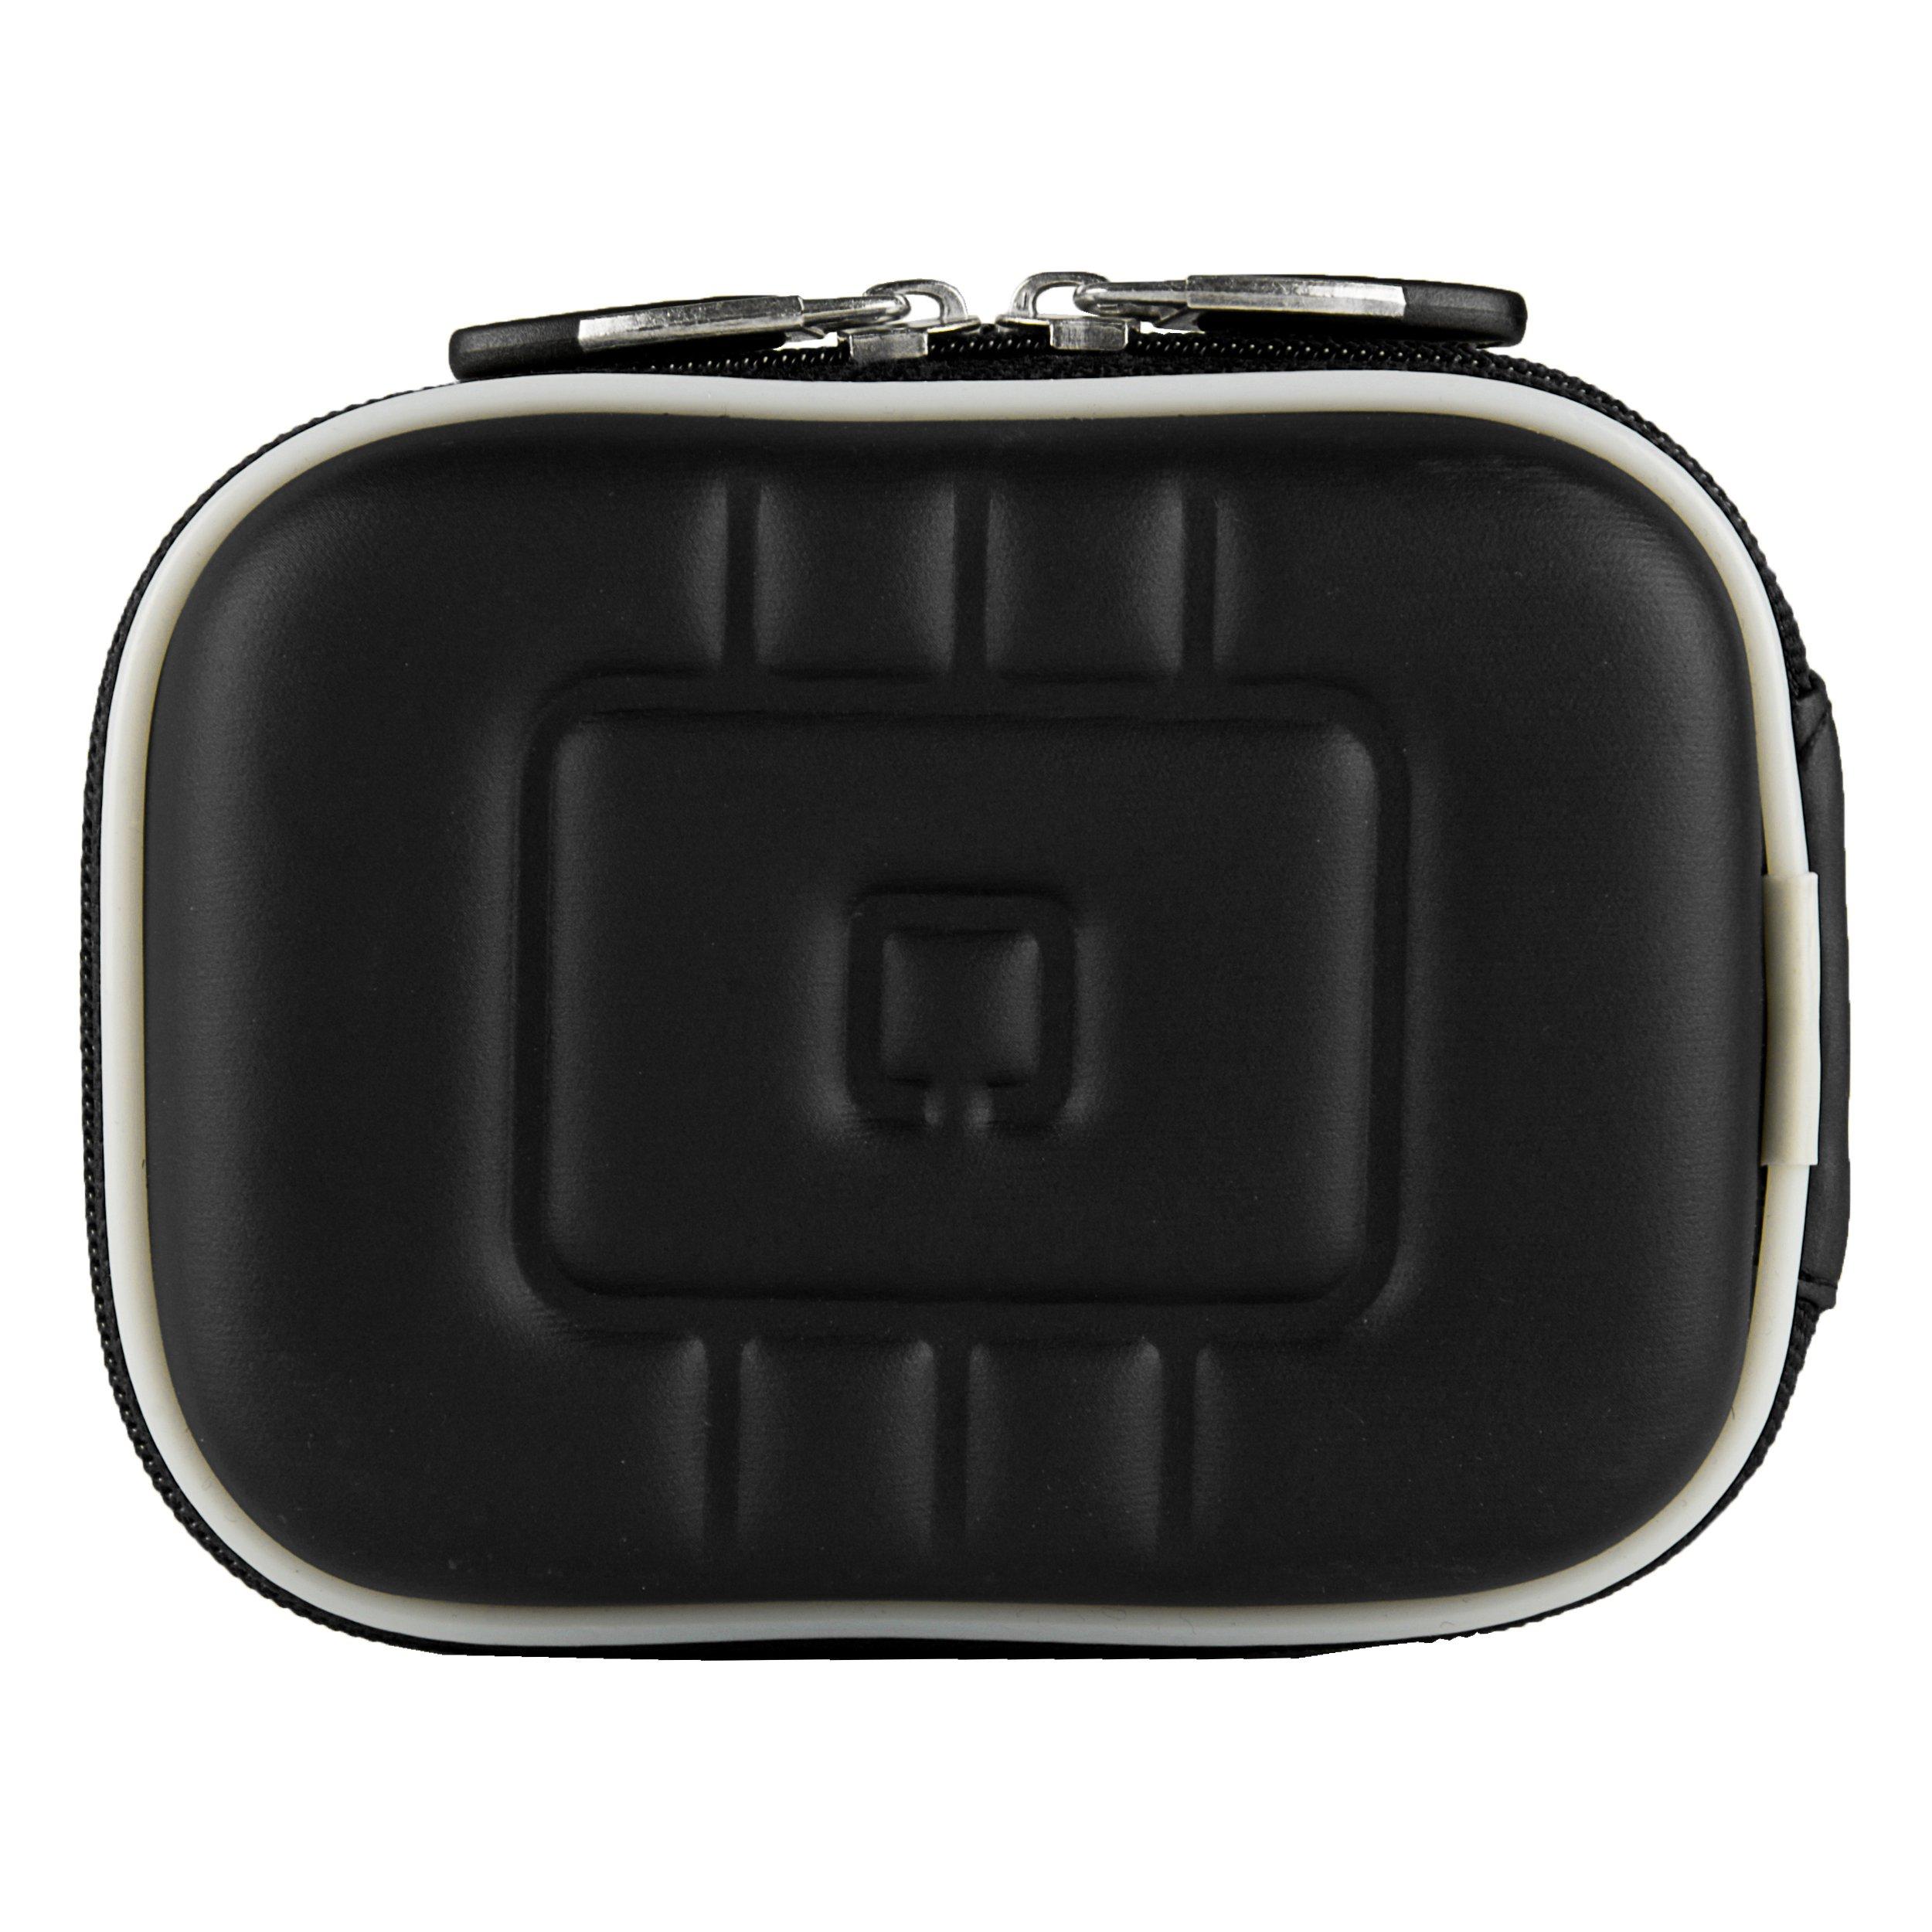 Kodak PlaySport HD Waterproof Pocket Video Camera, Mini Camcorder Accessories Kit: EVA Smooth Black Protective Hard Kodak Camera Case + Kodak Camera Tripod with Flexible Grip Legs + Live * Laugh * Love VG Wrist Band!!!